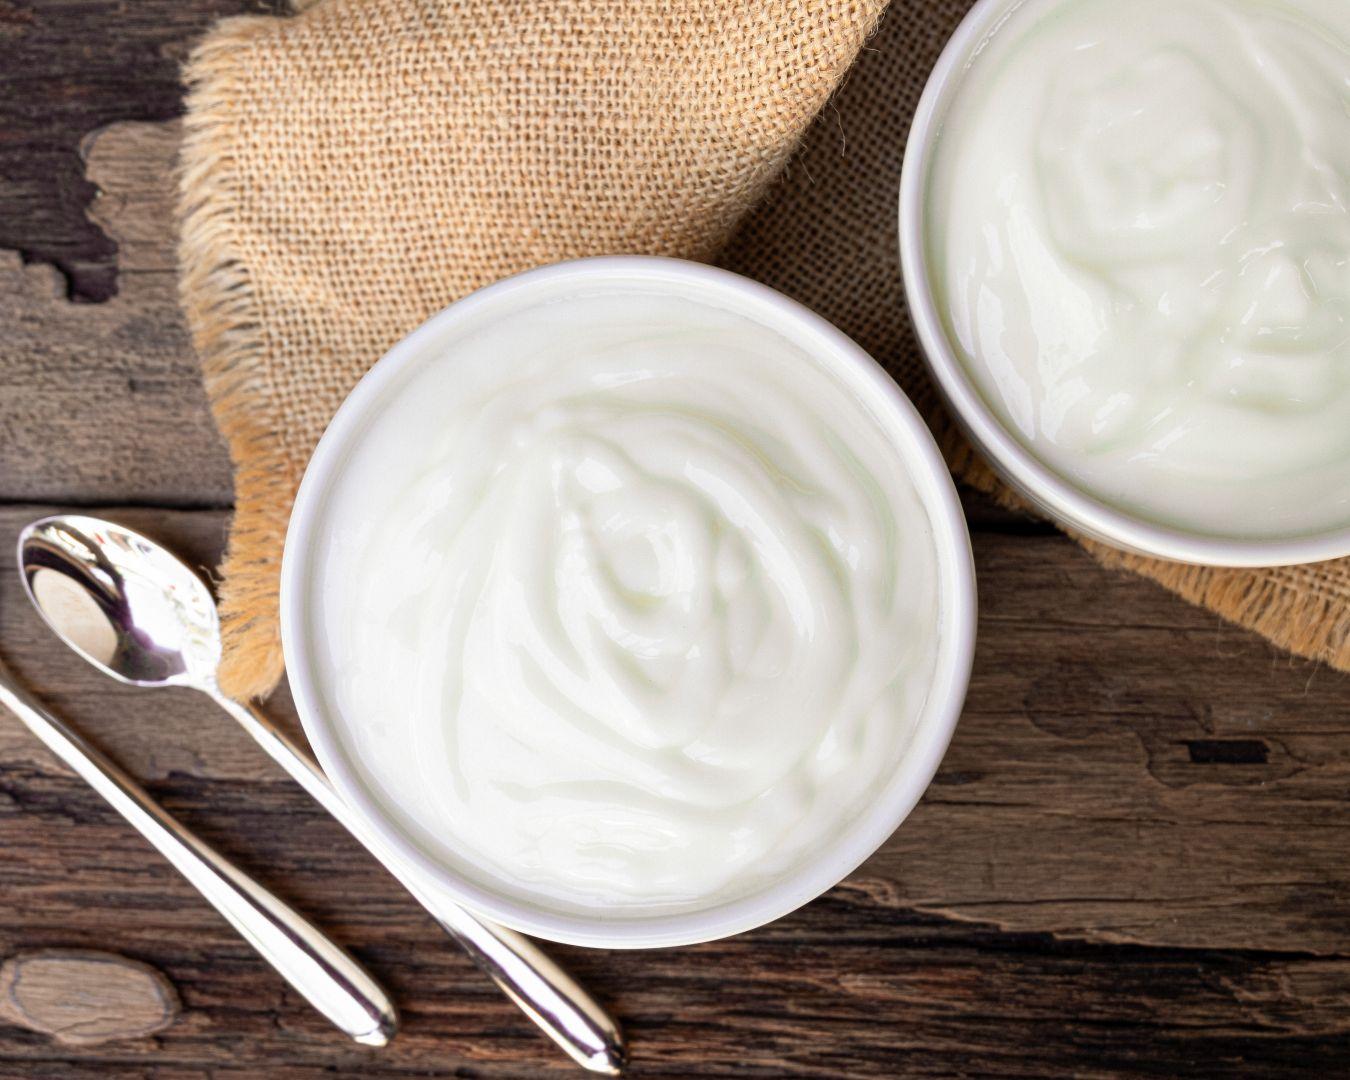 Colamos los yogures